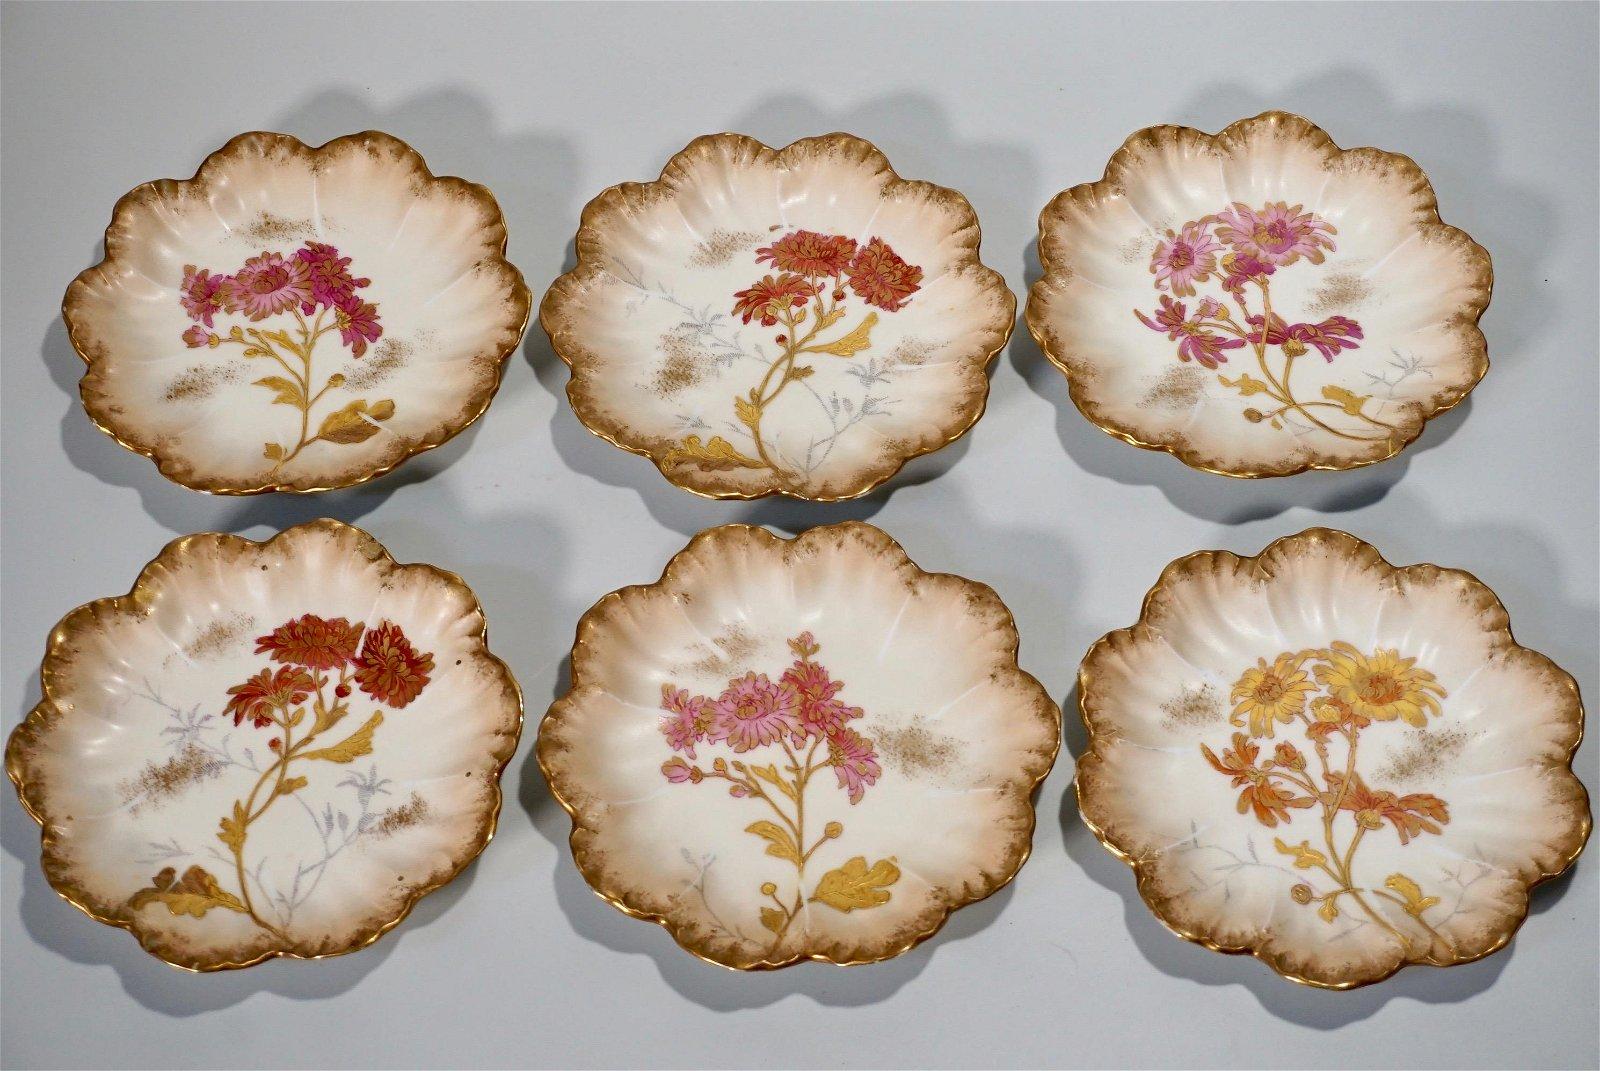 Antique Limoges Porcelain Plate Lot of 6 French Floral